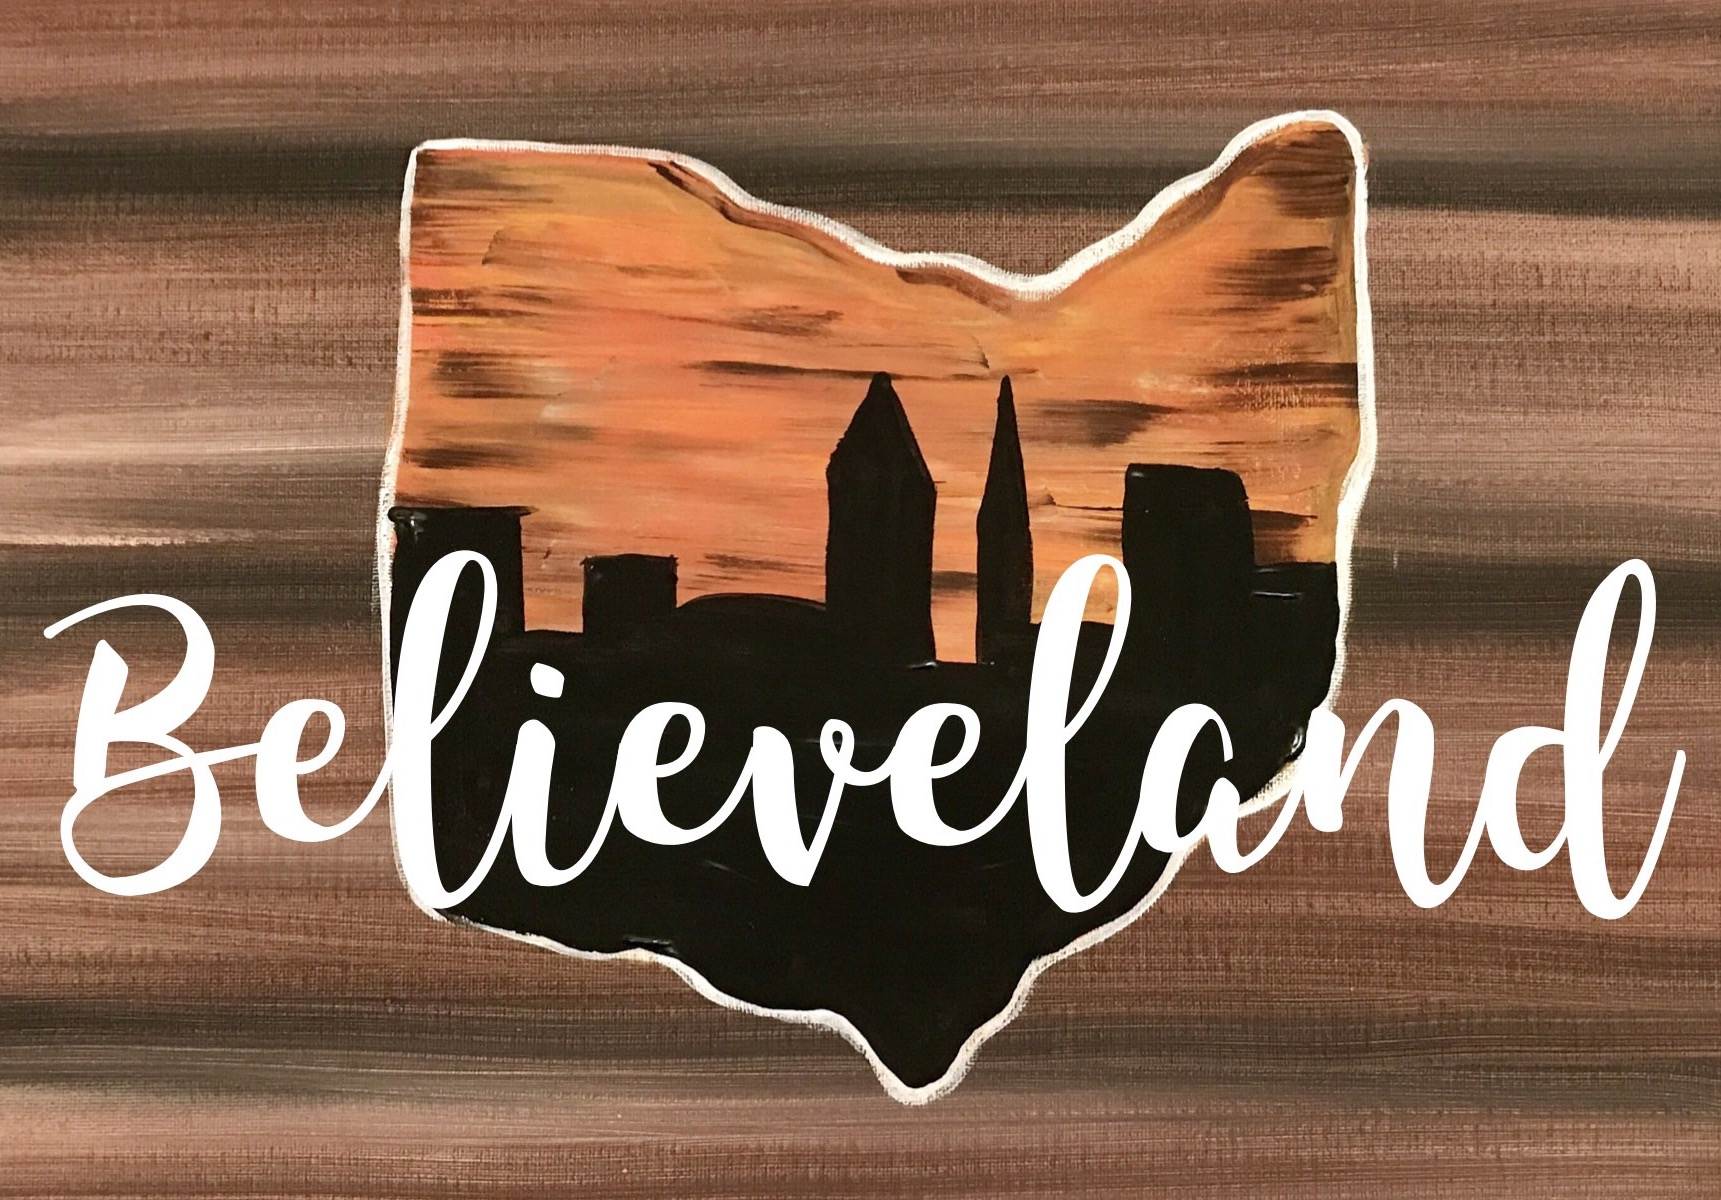 Cleveland/Bengals/NFL Ohio party